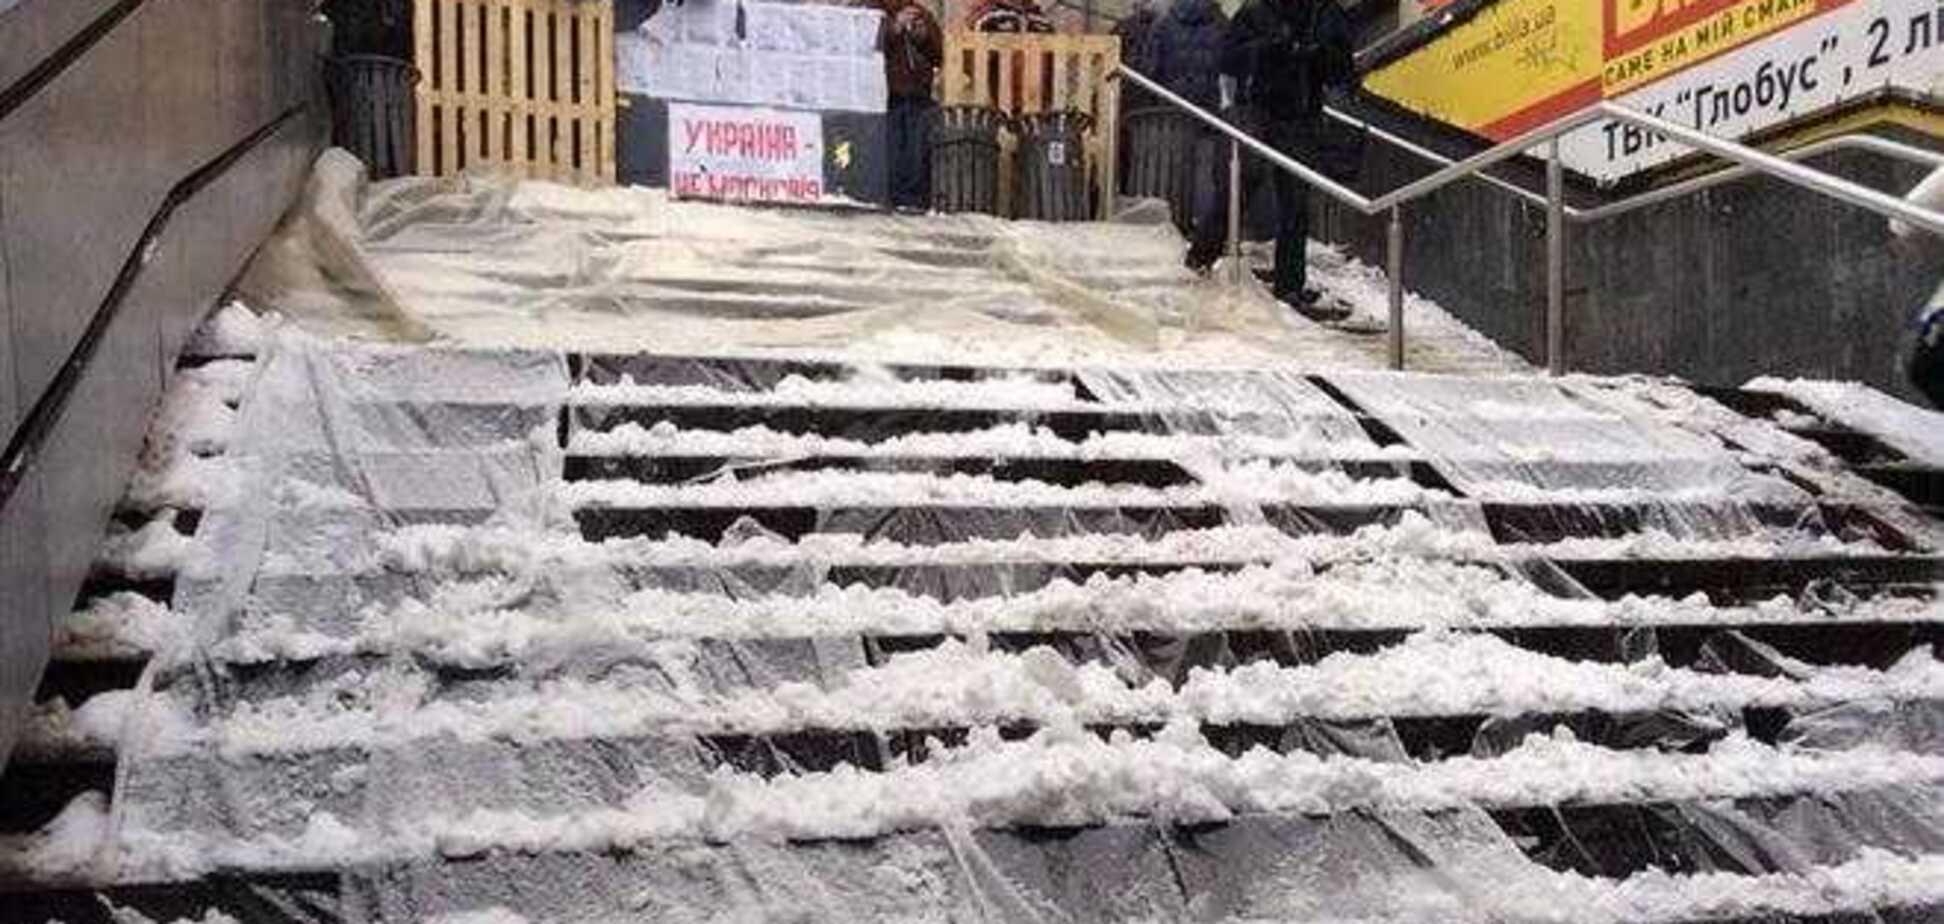 Евромайдановцы строят 'ловушки' для милиции на выходах из метро